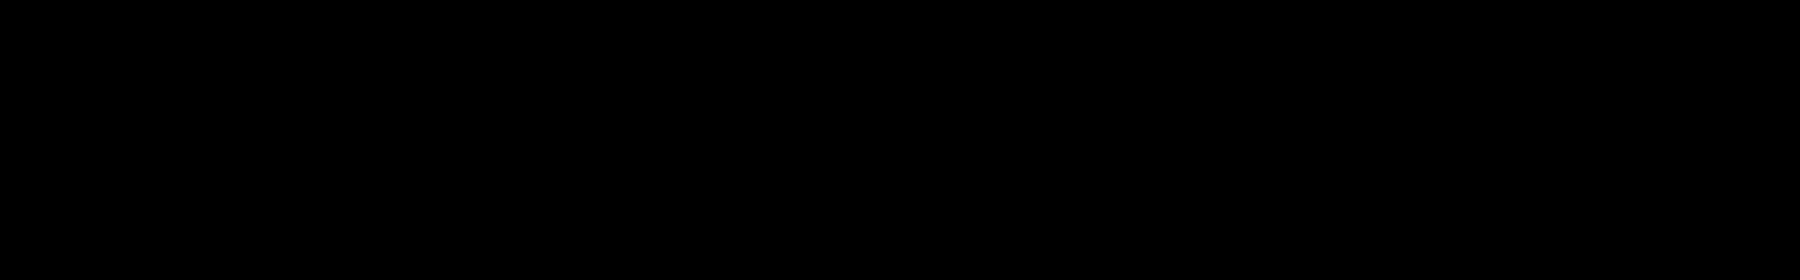 Neon Light audio waveform